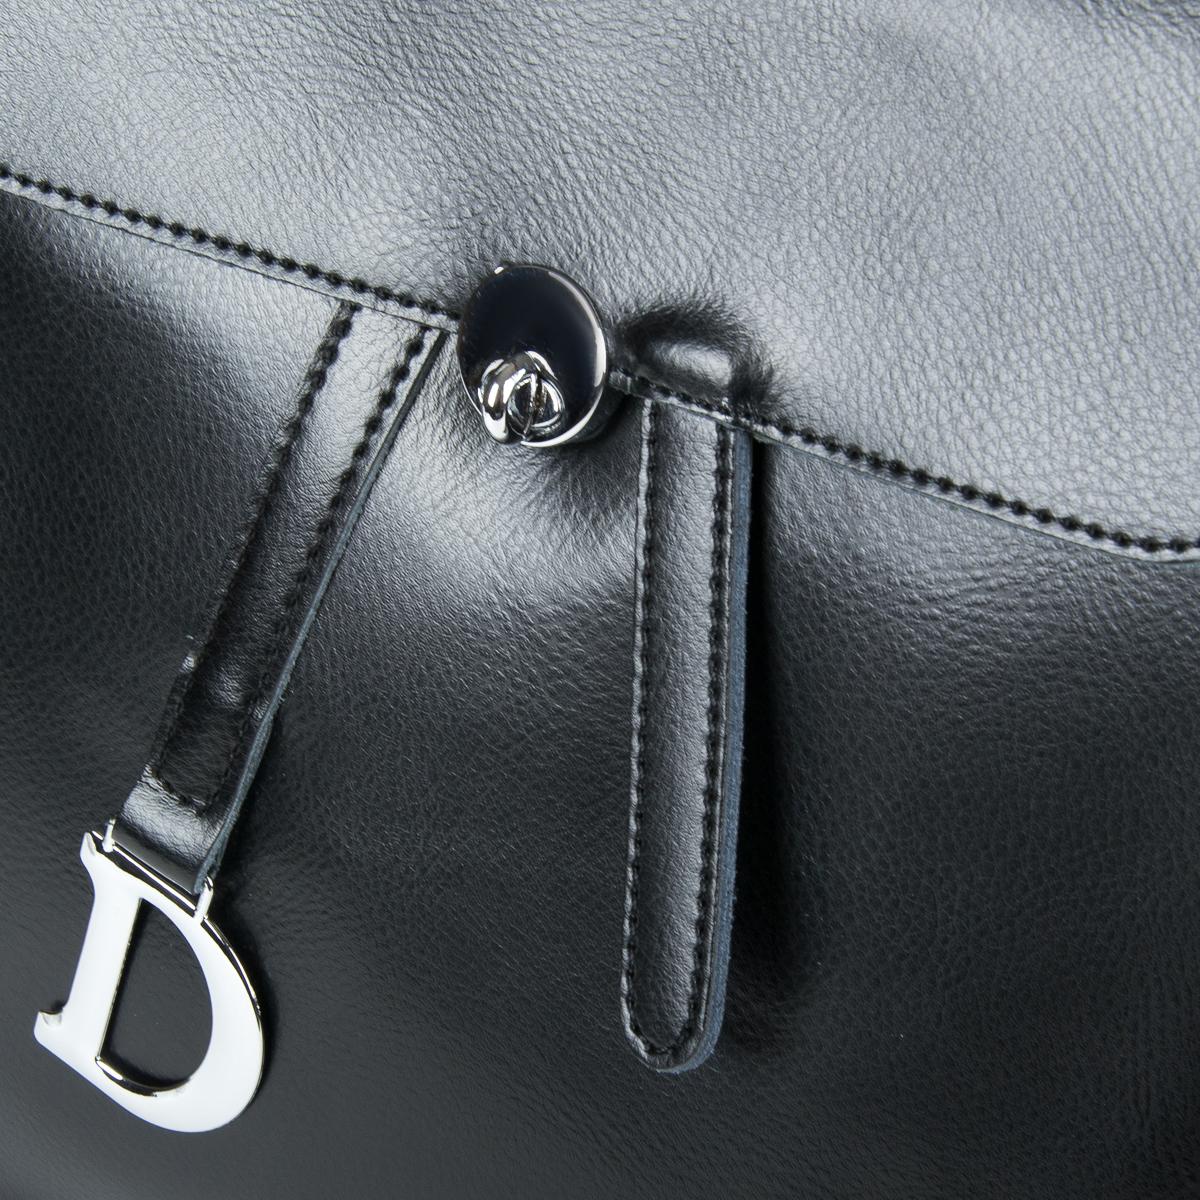 Сумка Женская Рюкзак кожа ALEX RAI 9-01 360 black - фото 3